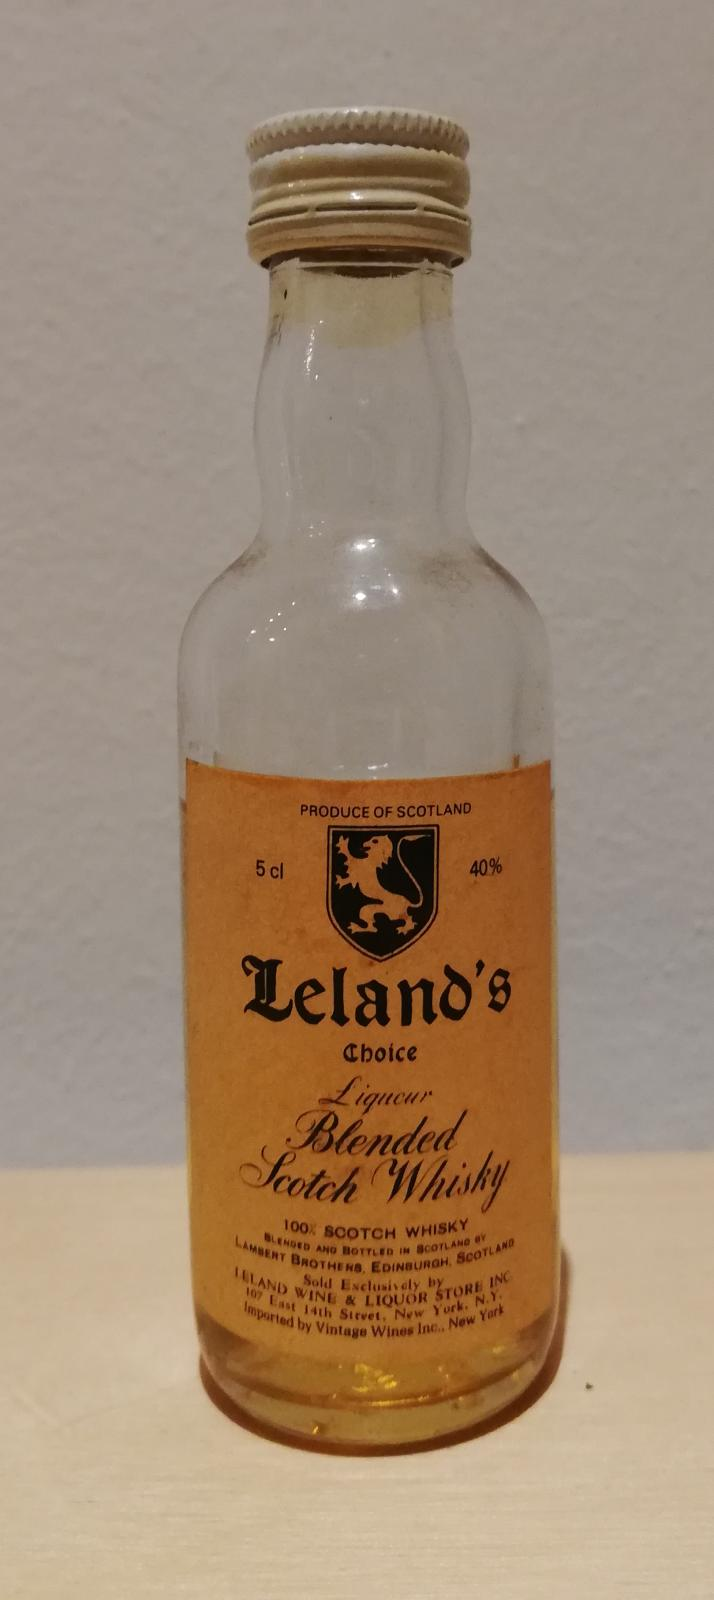 Blended Scotch Whisky Leland's Choice